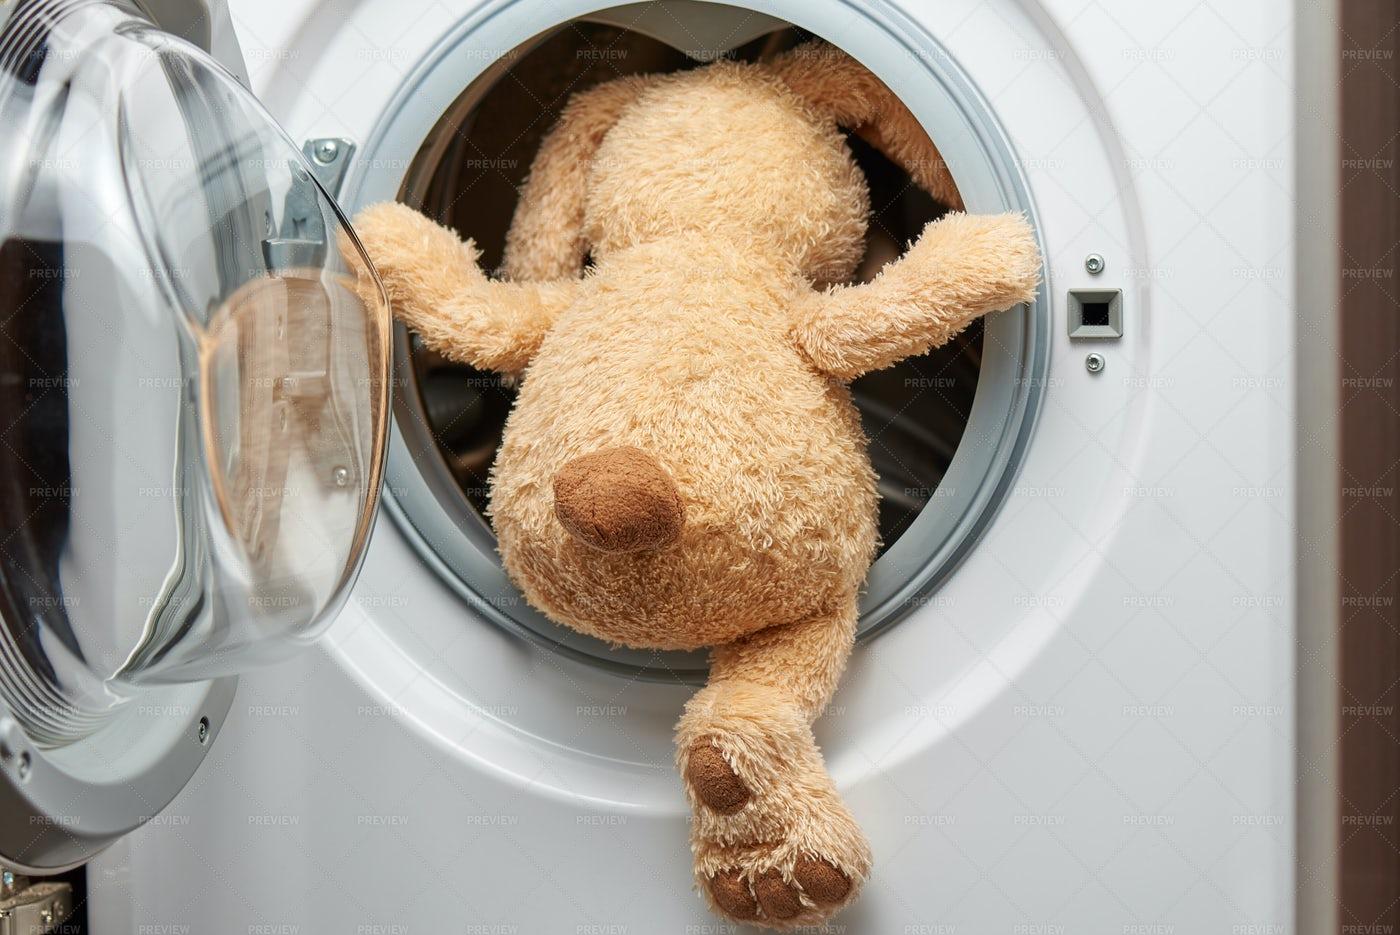 Teddy In Washing Machine.: Stock Photos